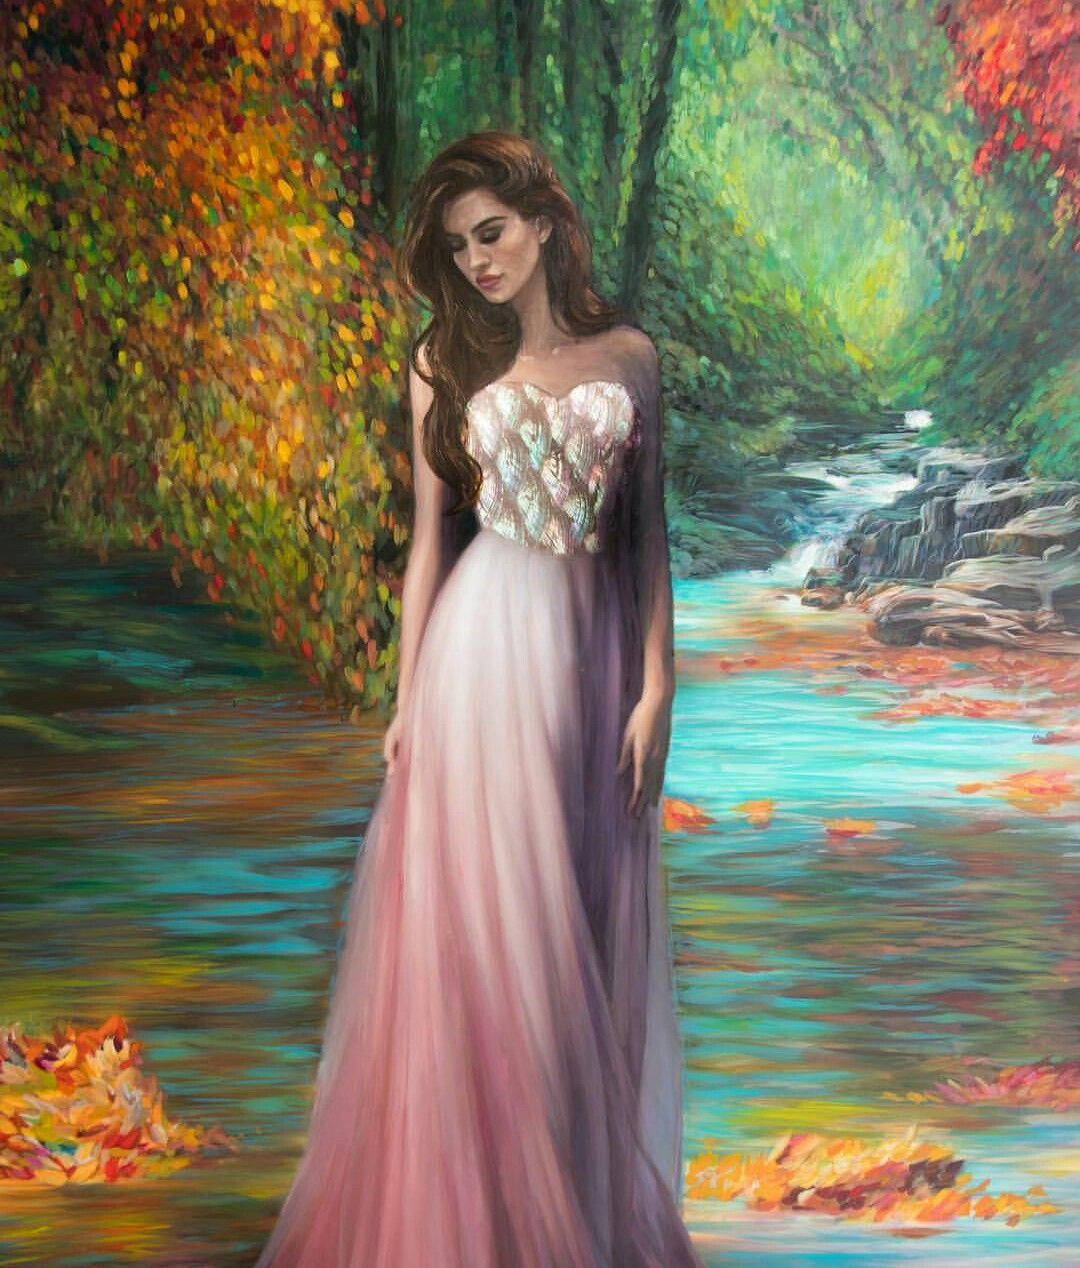 Lindsay Rapp Gallery Art, Lindsay rapp, Beautiful art